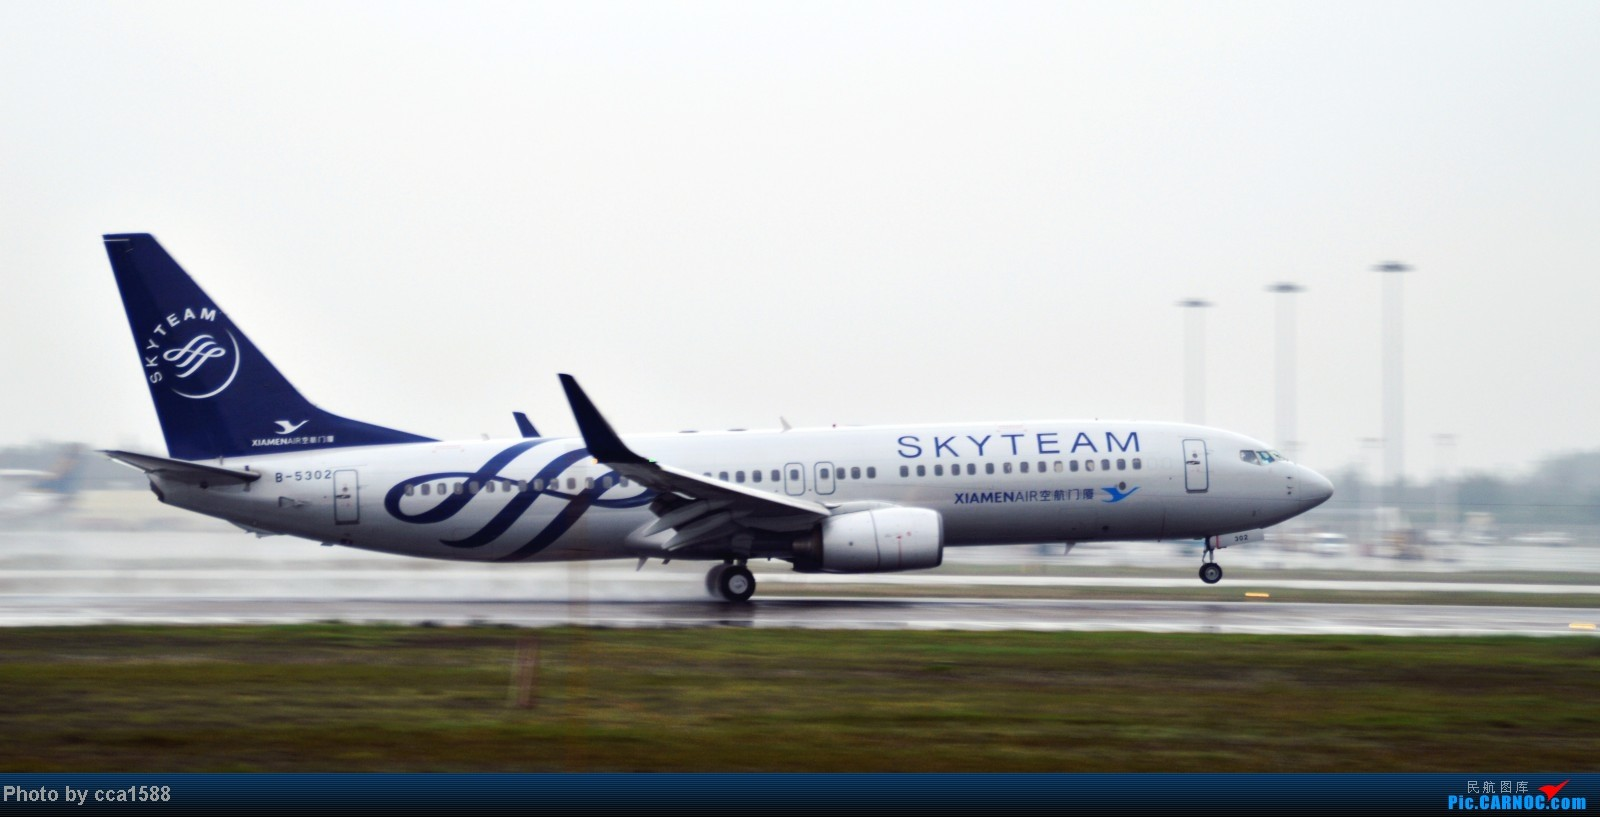 Re:[原创]4.26FOC拍机--烂天出好机,各种奇葩货~~ BOEING 737-800 B-5302 中国福州长乐机场